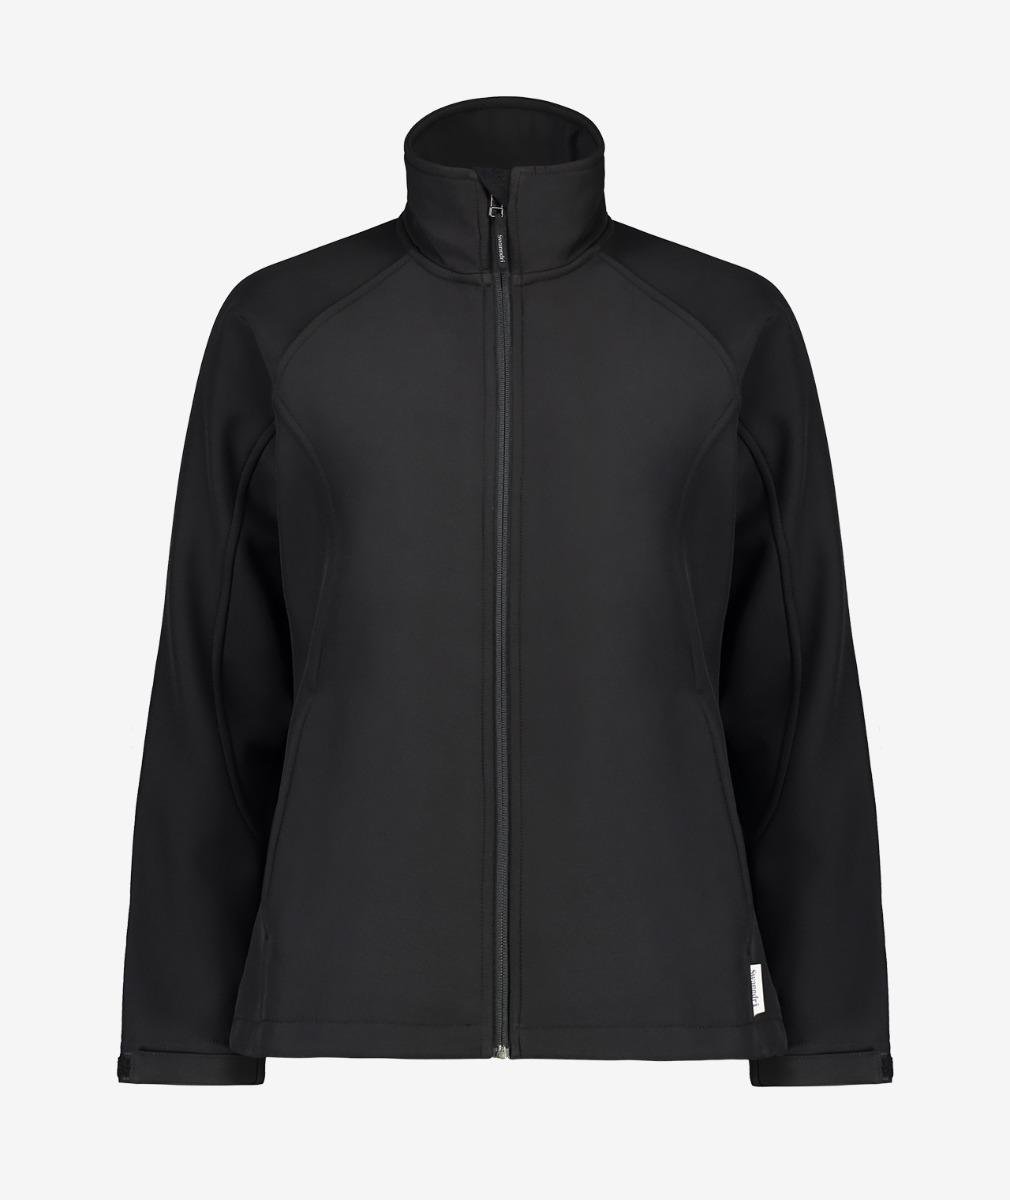 Swanndri Women's Cosby Softshell Jacket in Black